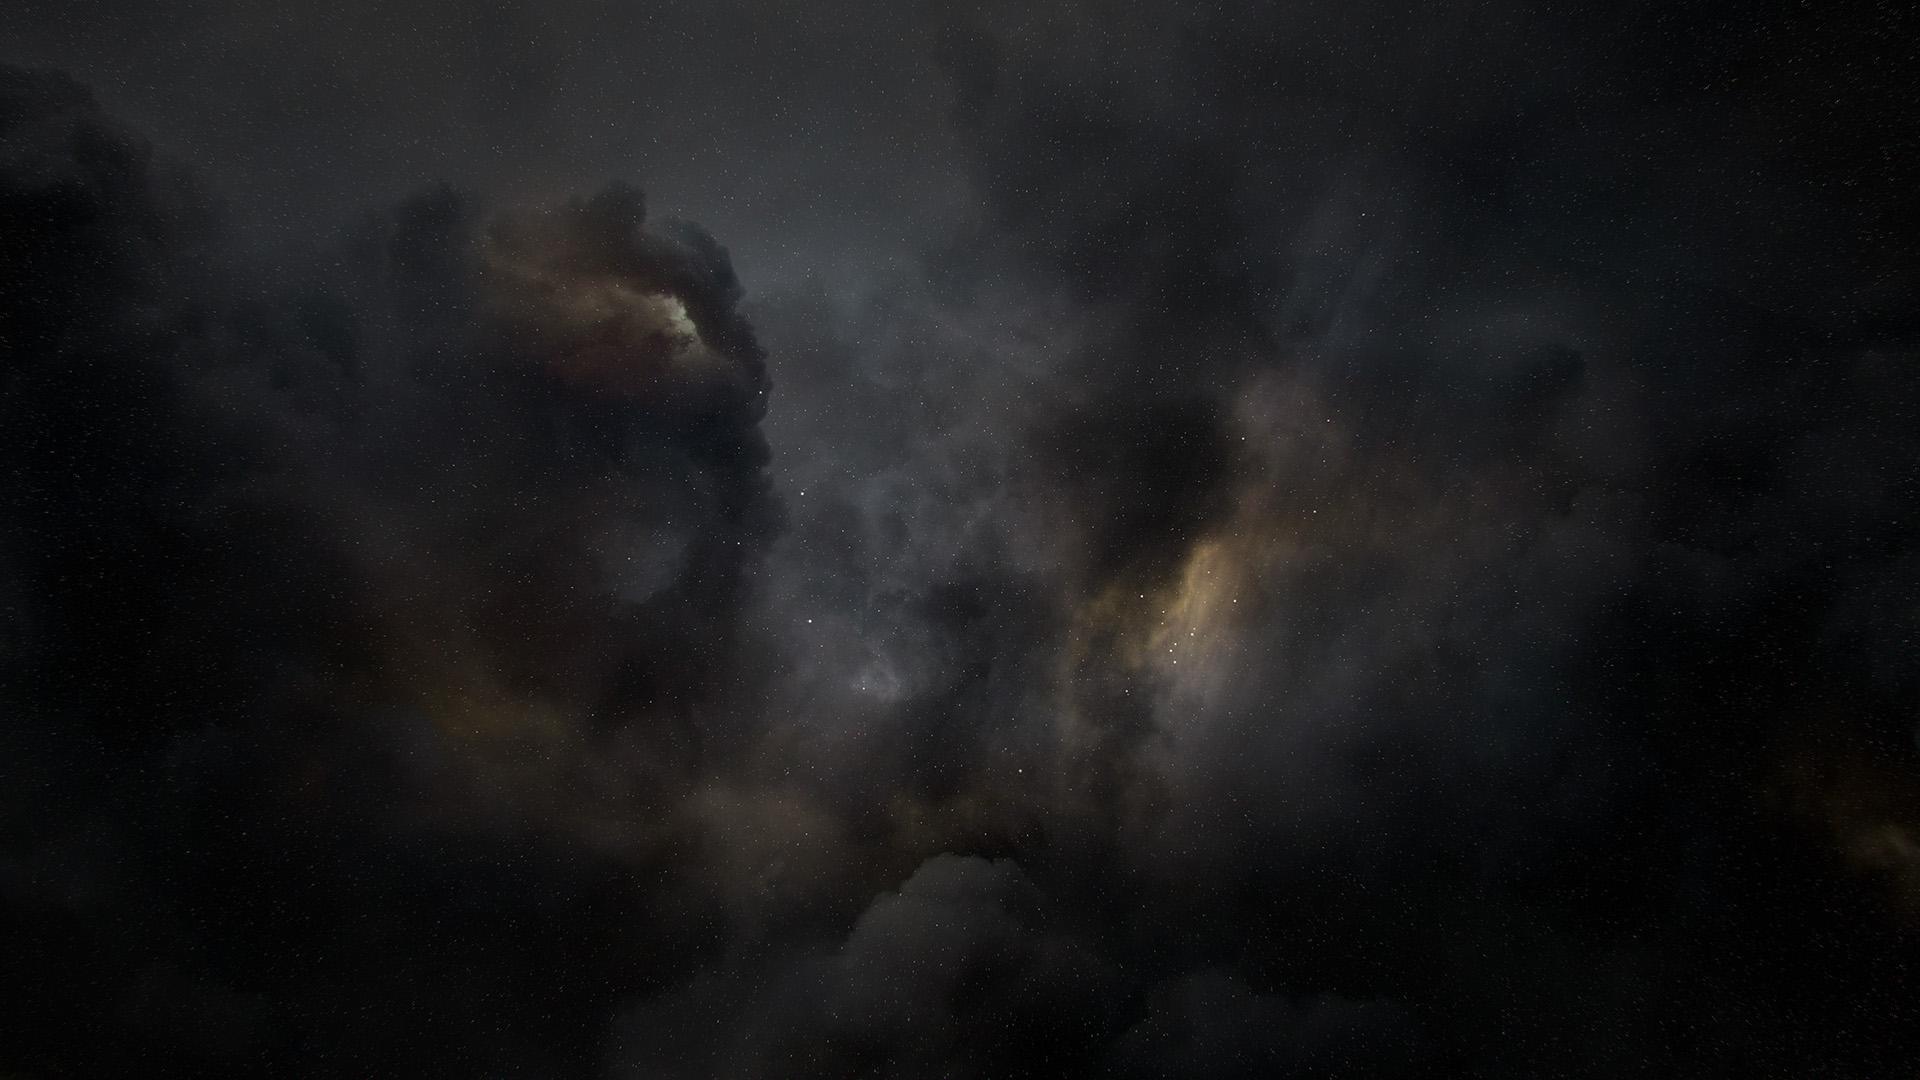 Expansive Nebula